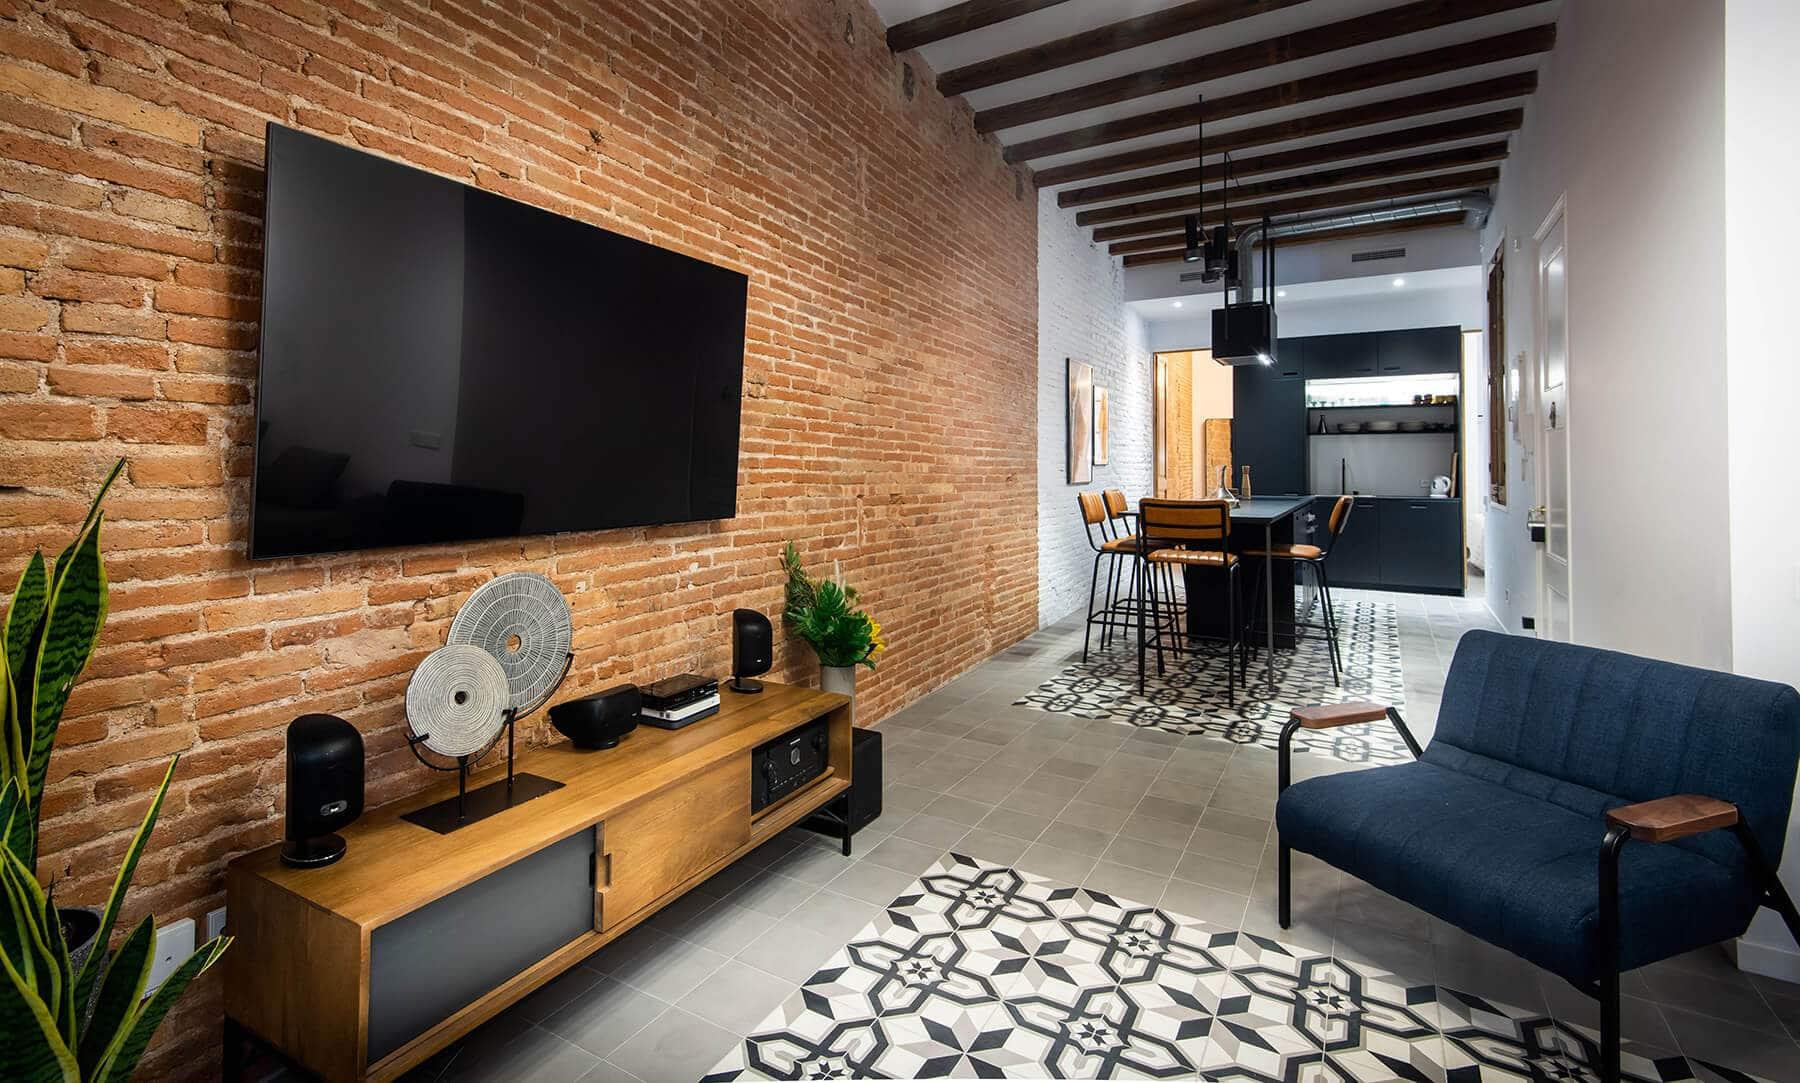 The importance of Interior Design 3